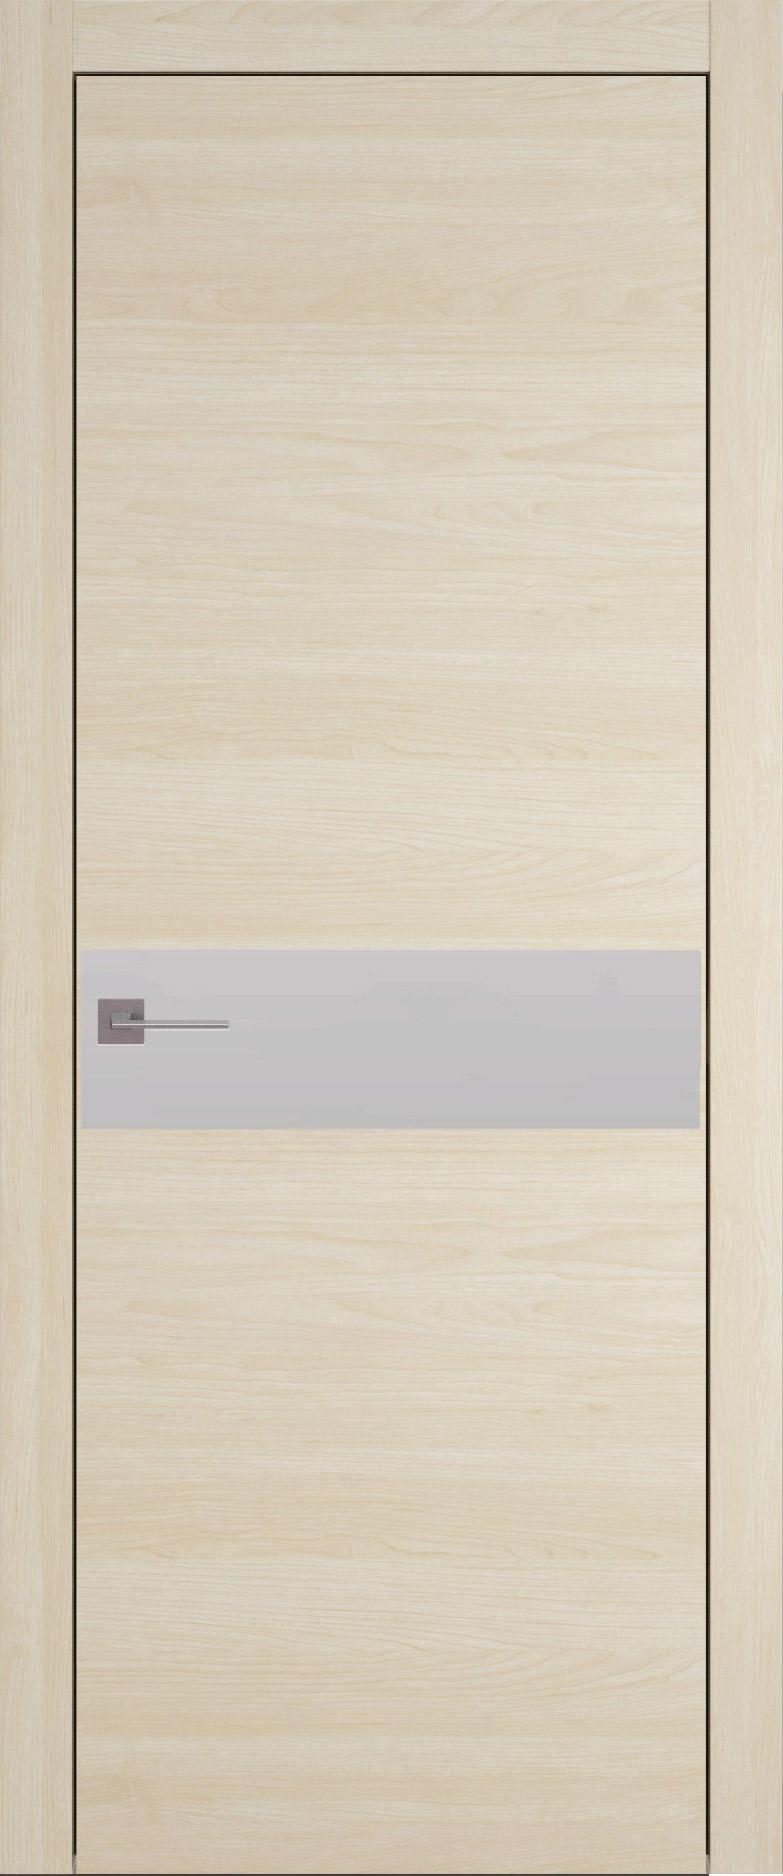 Tivoli И-4 цвет - Клен Без стекла (ДГ)